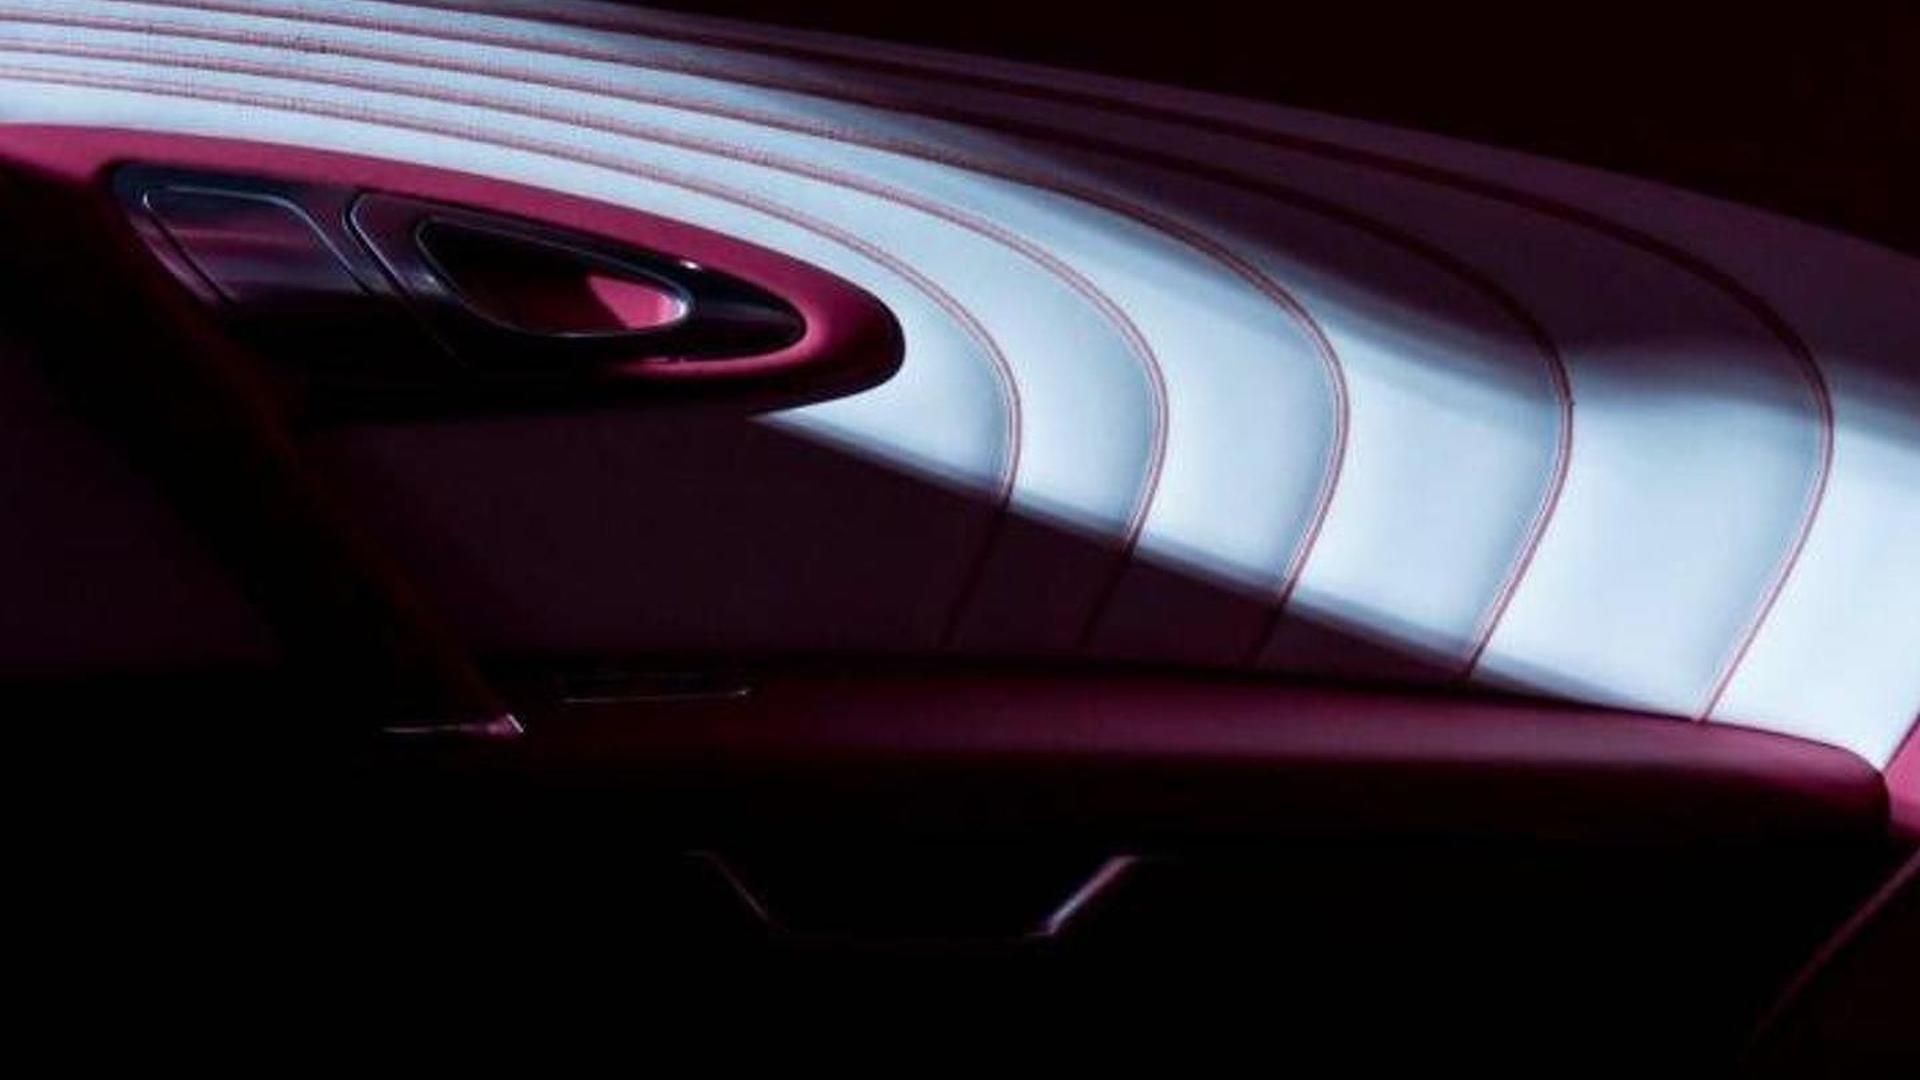 Карта двери Bugatti Veyron Grand Sport Vitesse Cristal